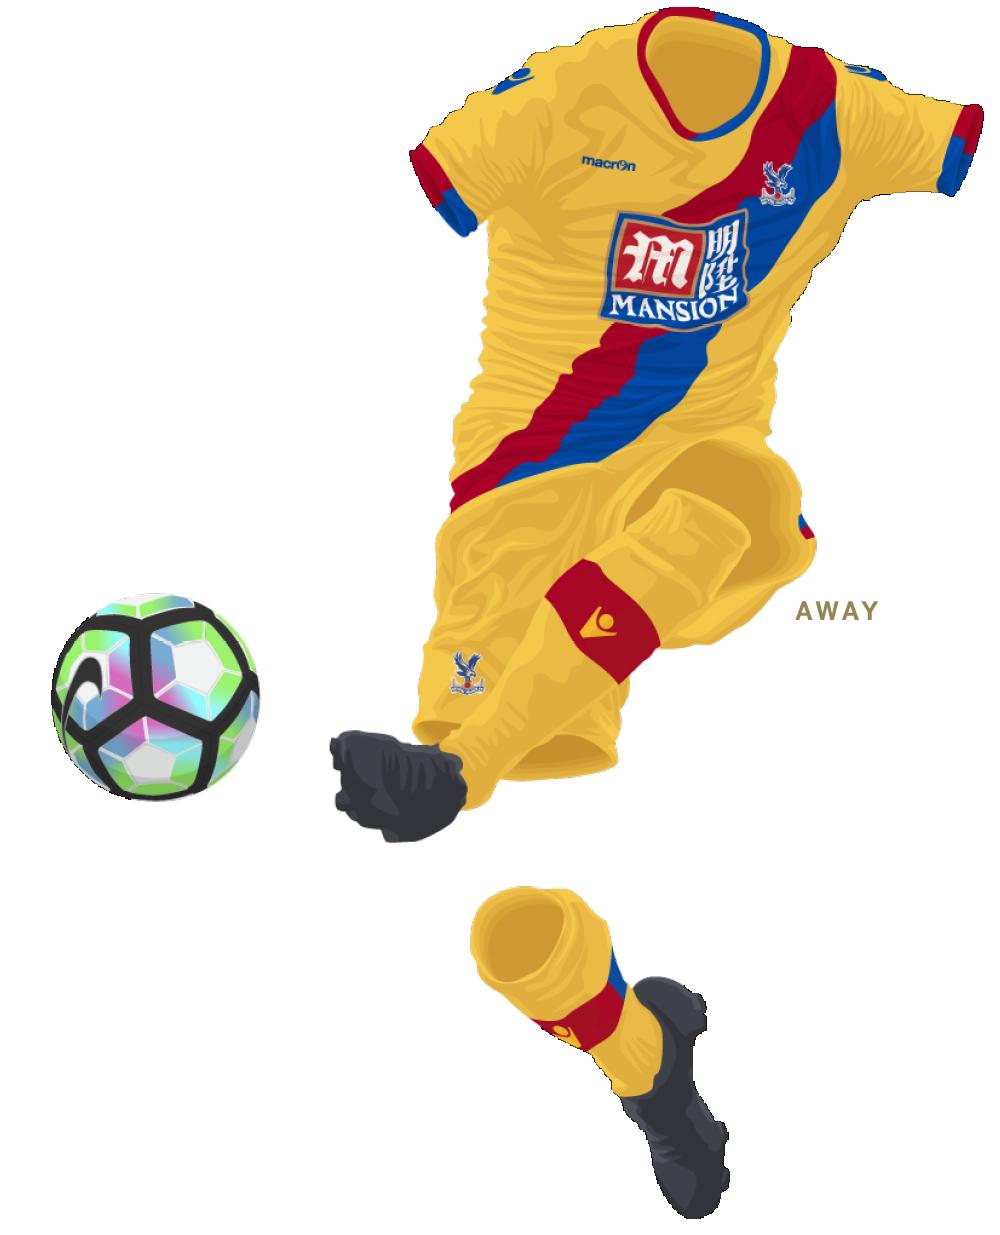 Premier League Kits Soccer kits, Premier league, Football